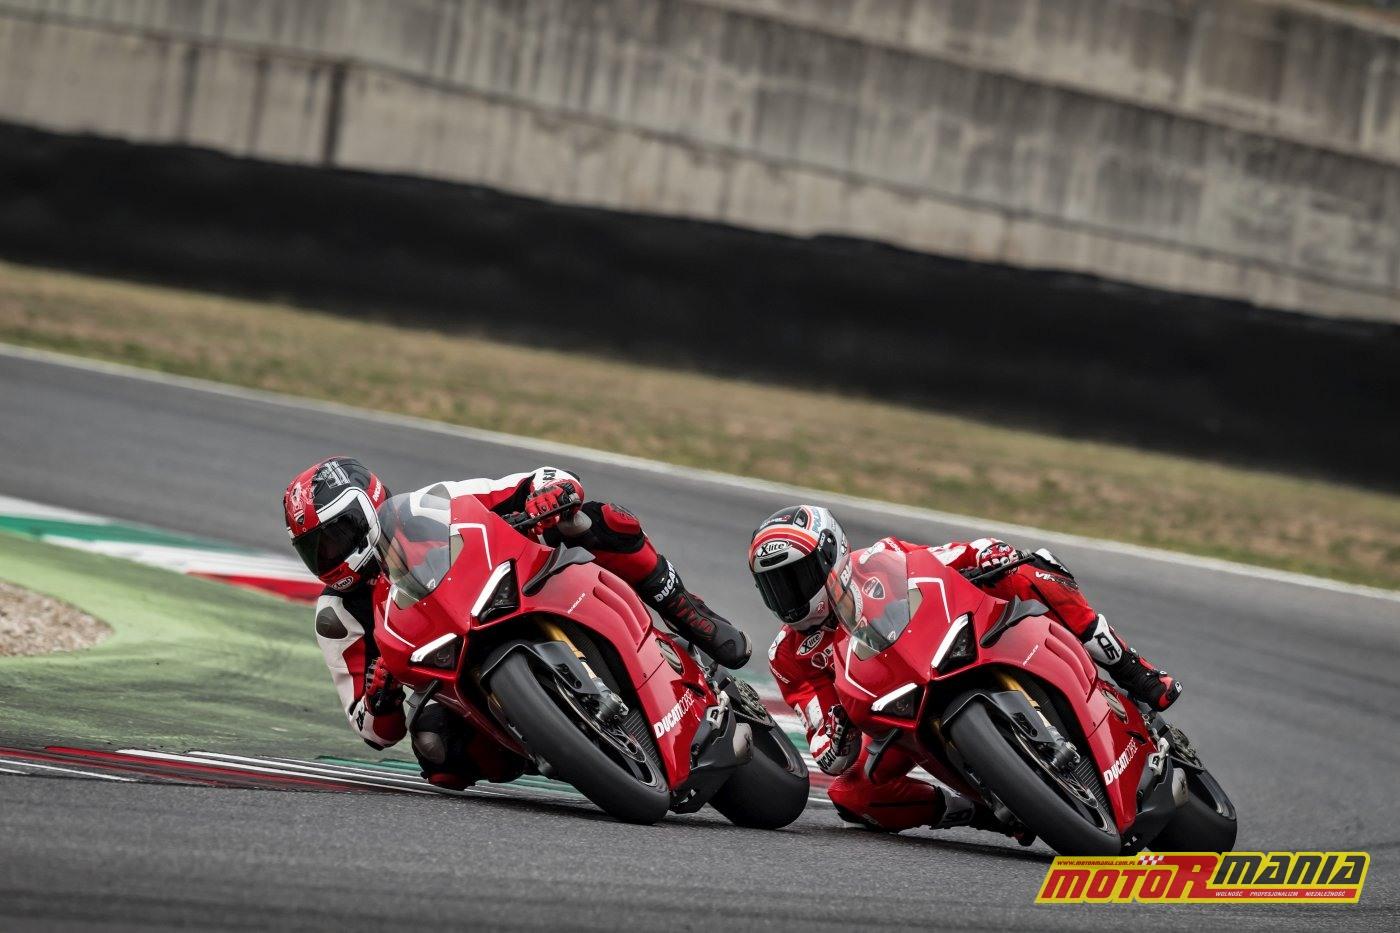 Ducati Panigale V4 R 2019 (23)